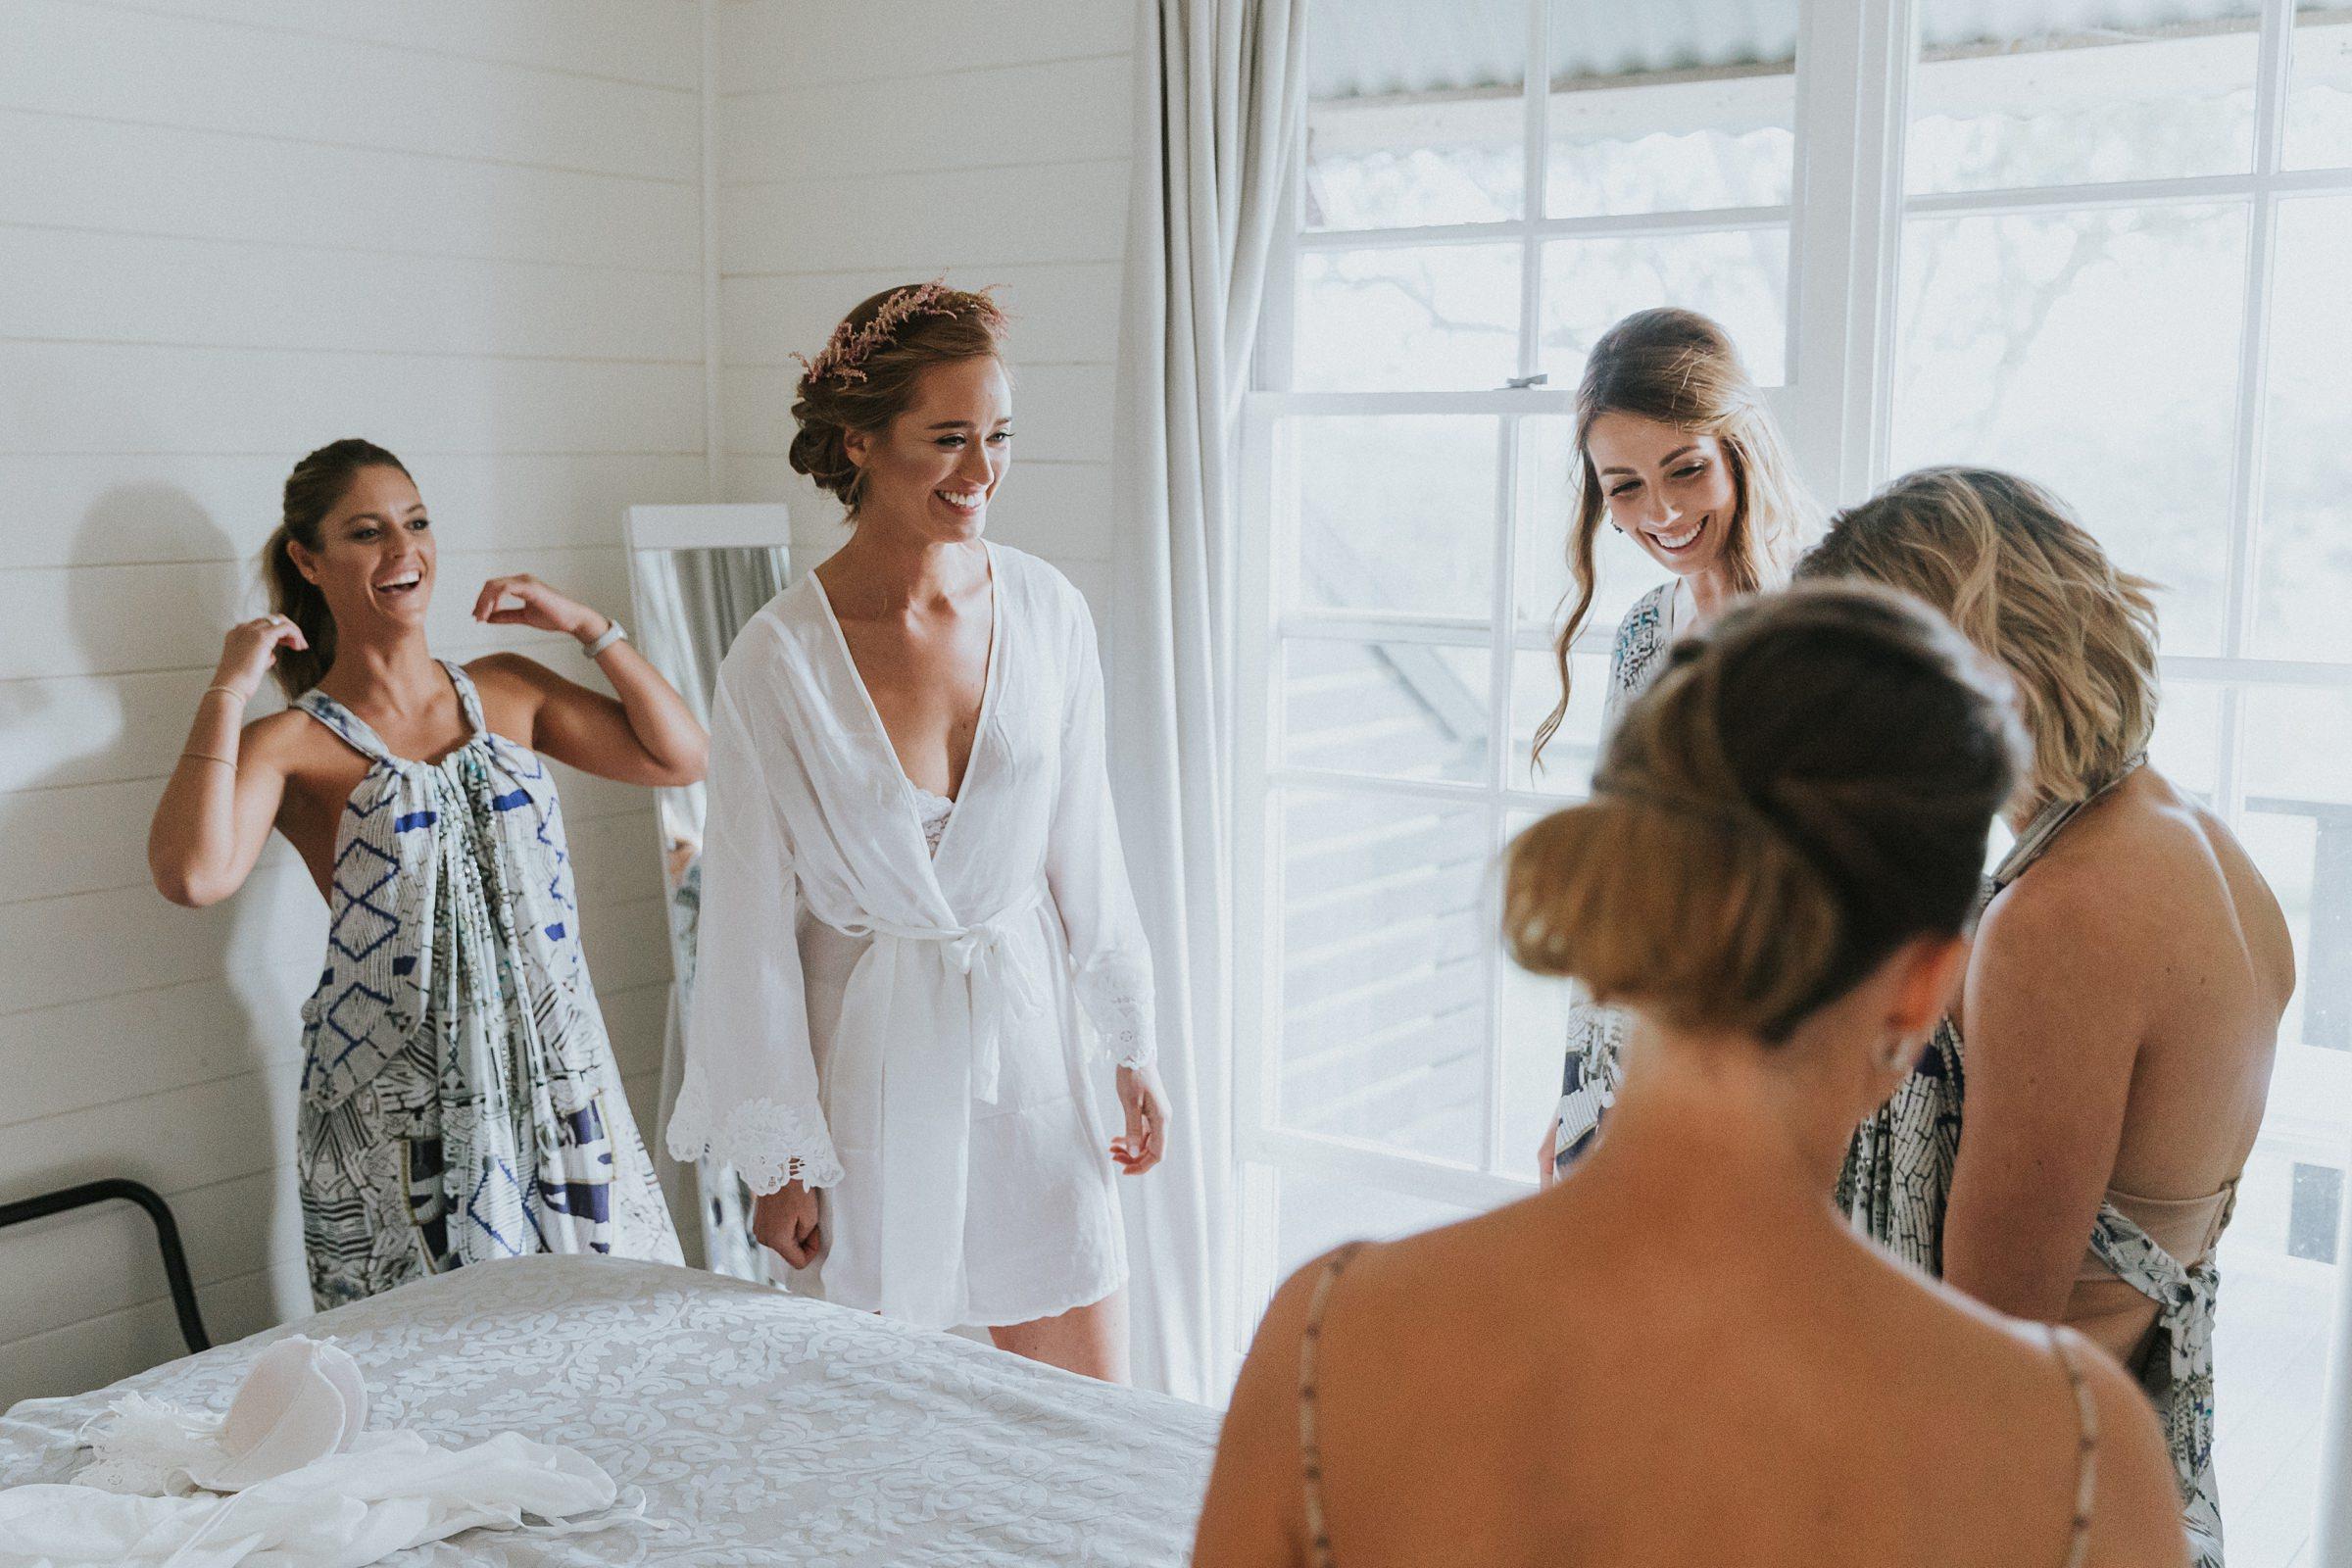 documentary wedding photography at mali brae farm